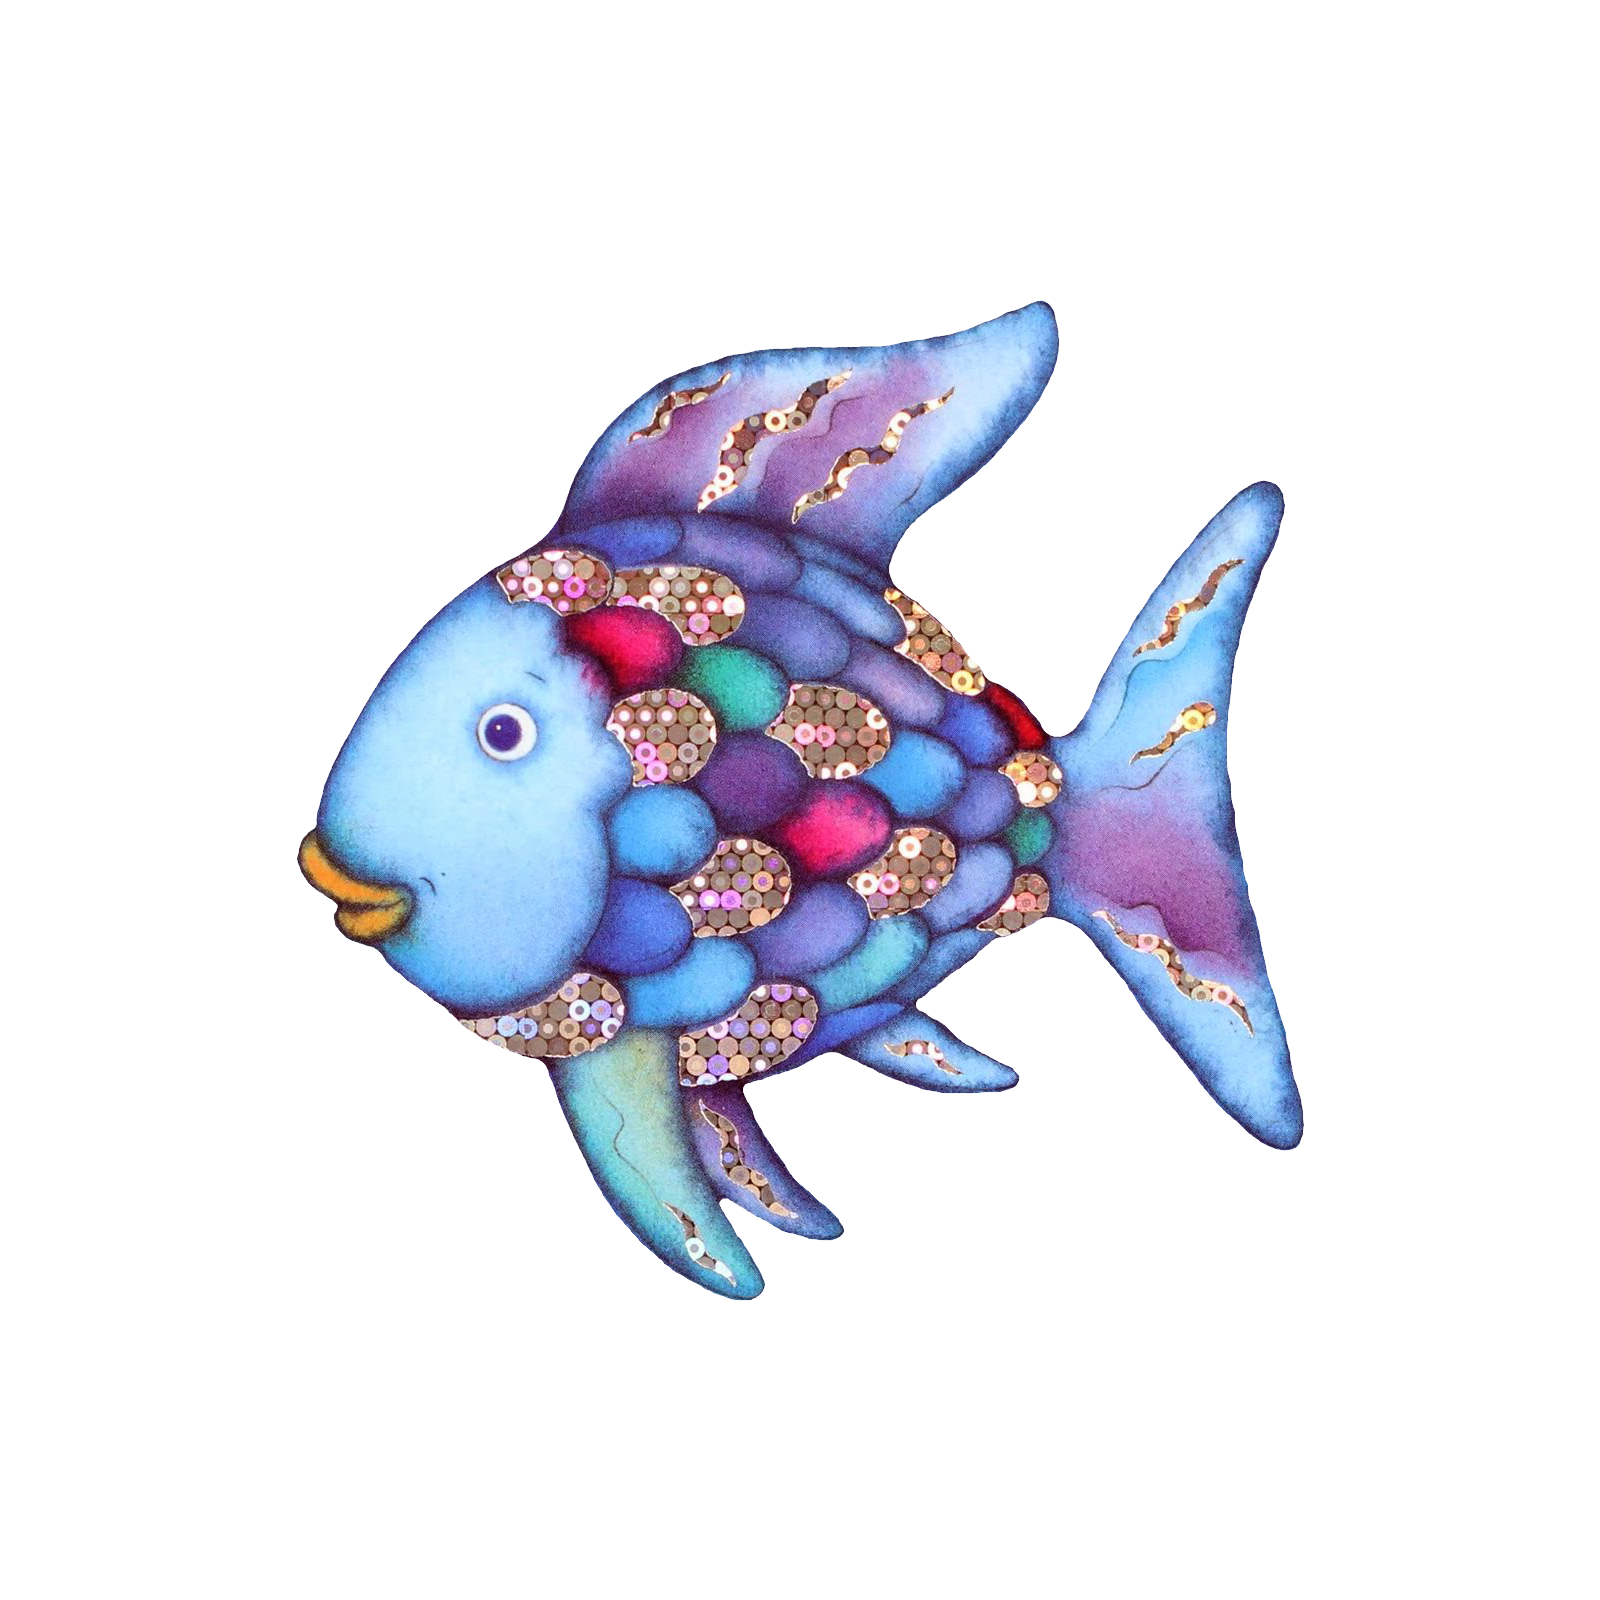 Rainbow Fish With Images Rainbow Fish Fish Design Art